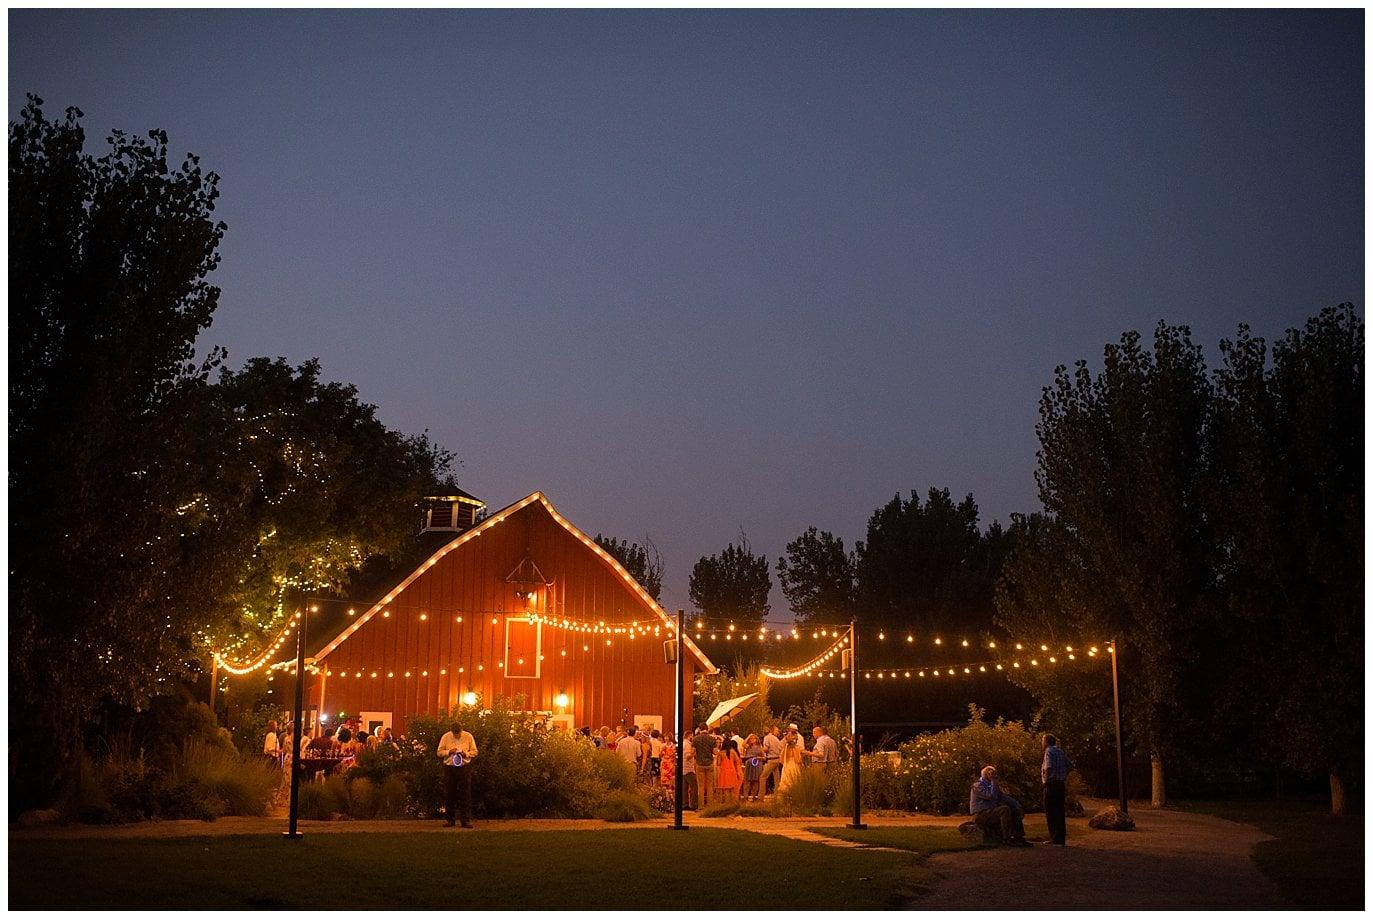 Denver Botanic Gardens at Chatfield wedding barn photo